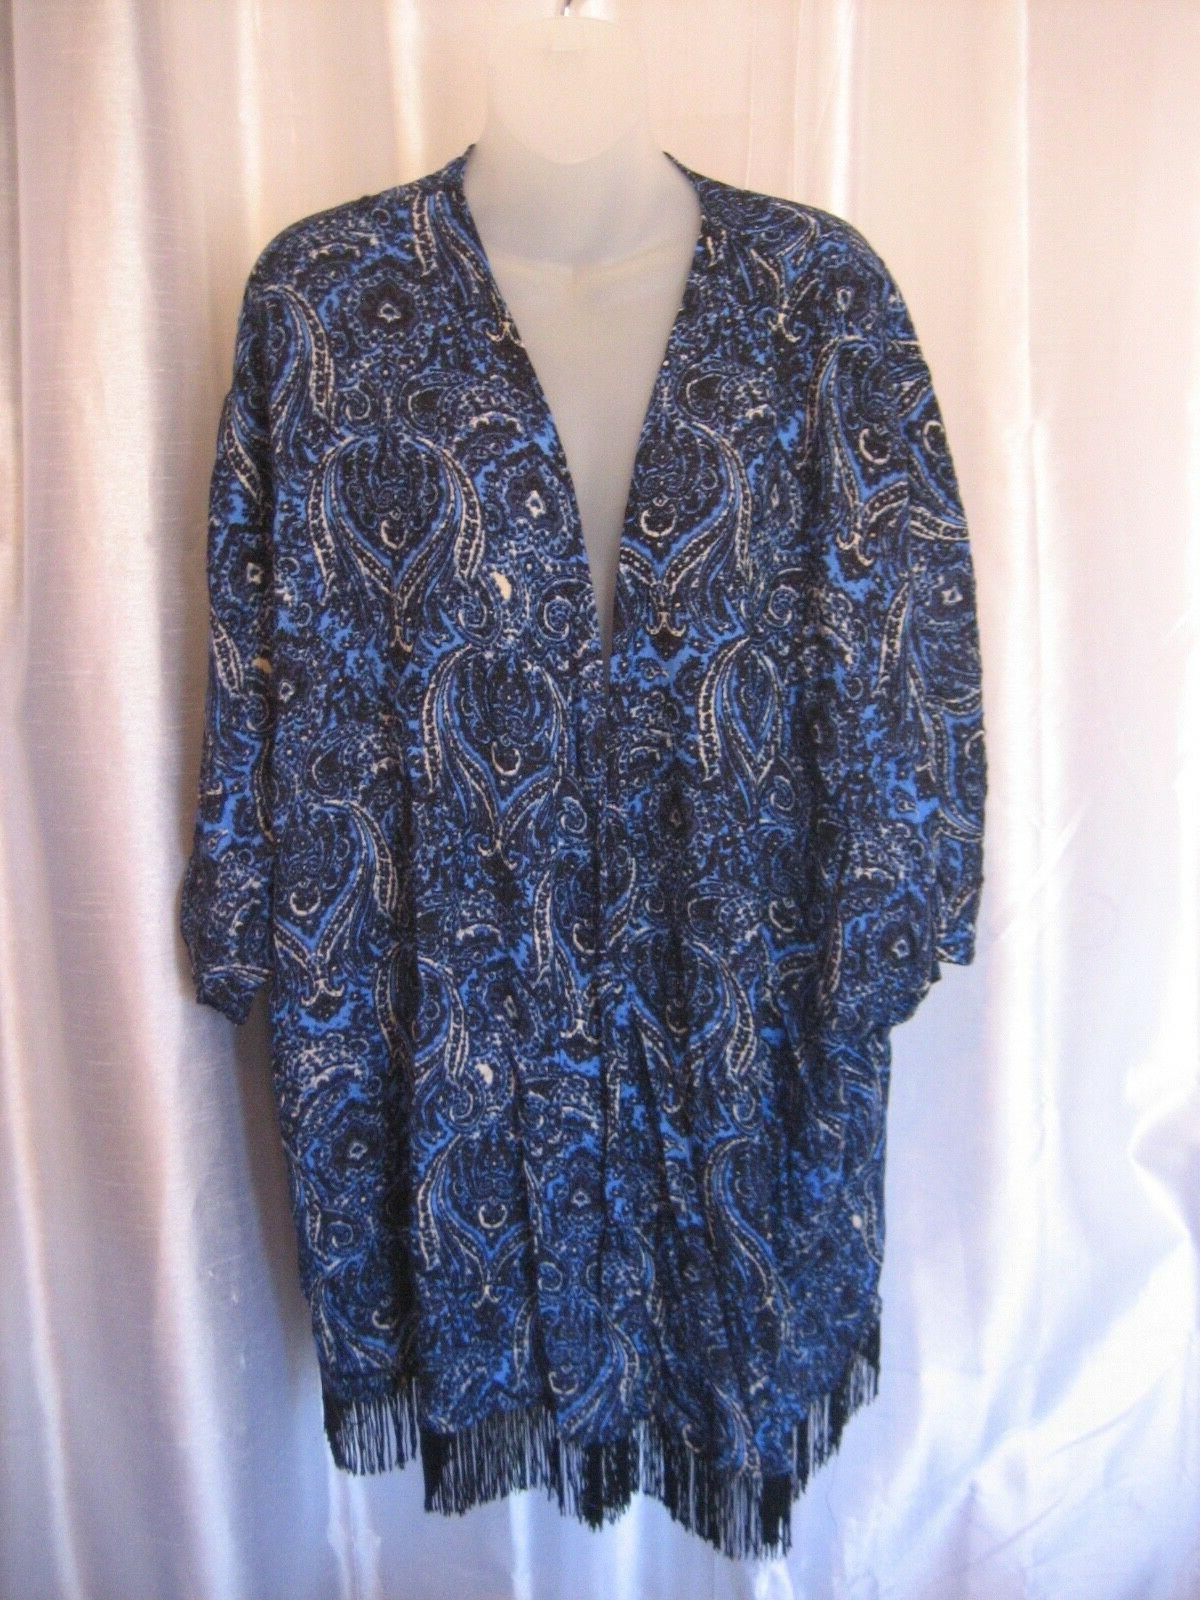 French Laundry Women's Black & Blue Unlined Duster Coat 100%